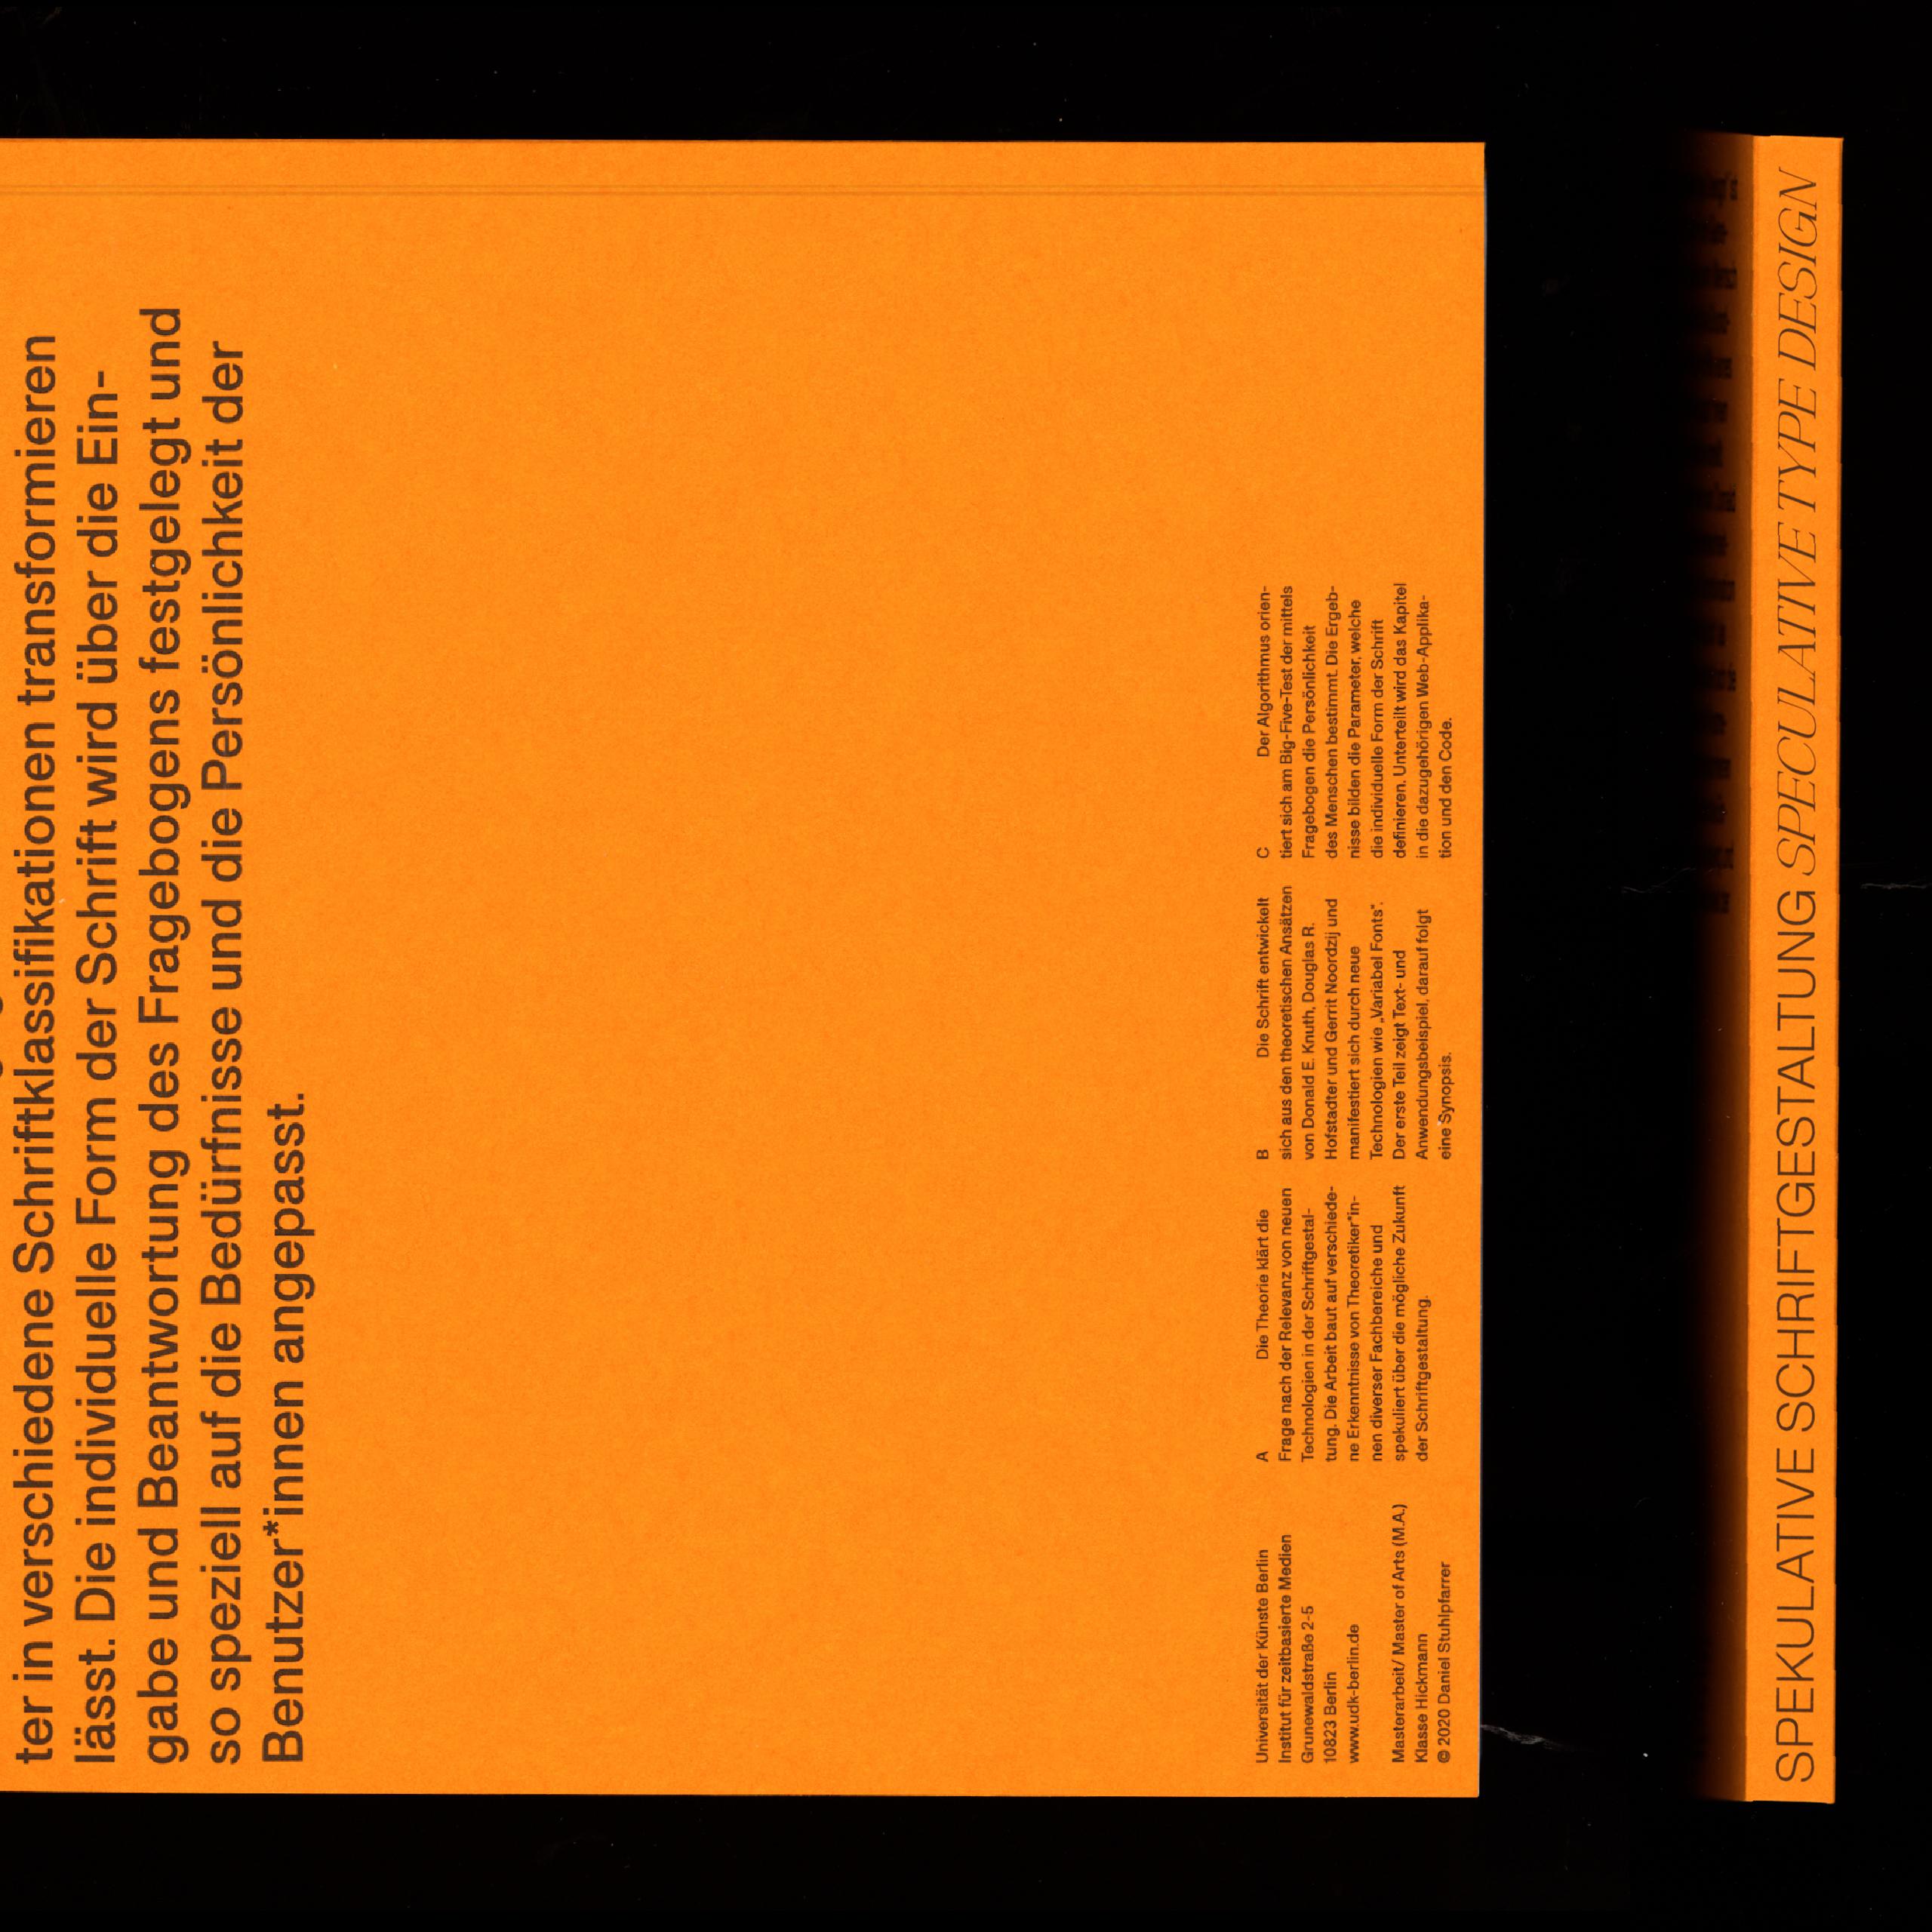 Daniel_Stuhlpfarrer_Spekulative-Schriftgestaltung-Speculative-Type-Design_WEB60